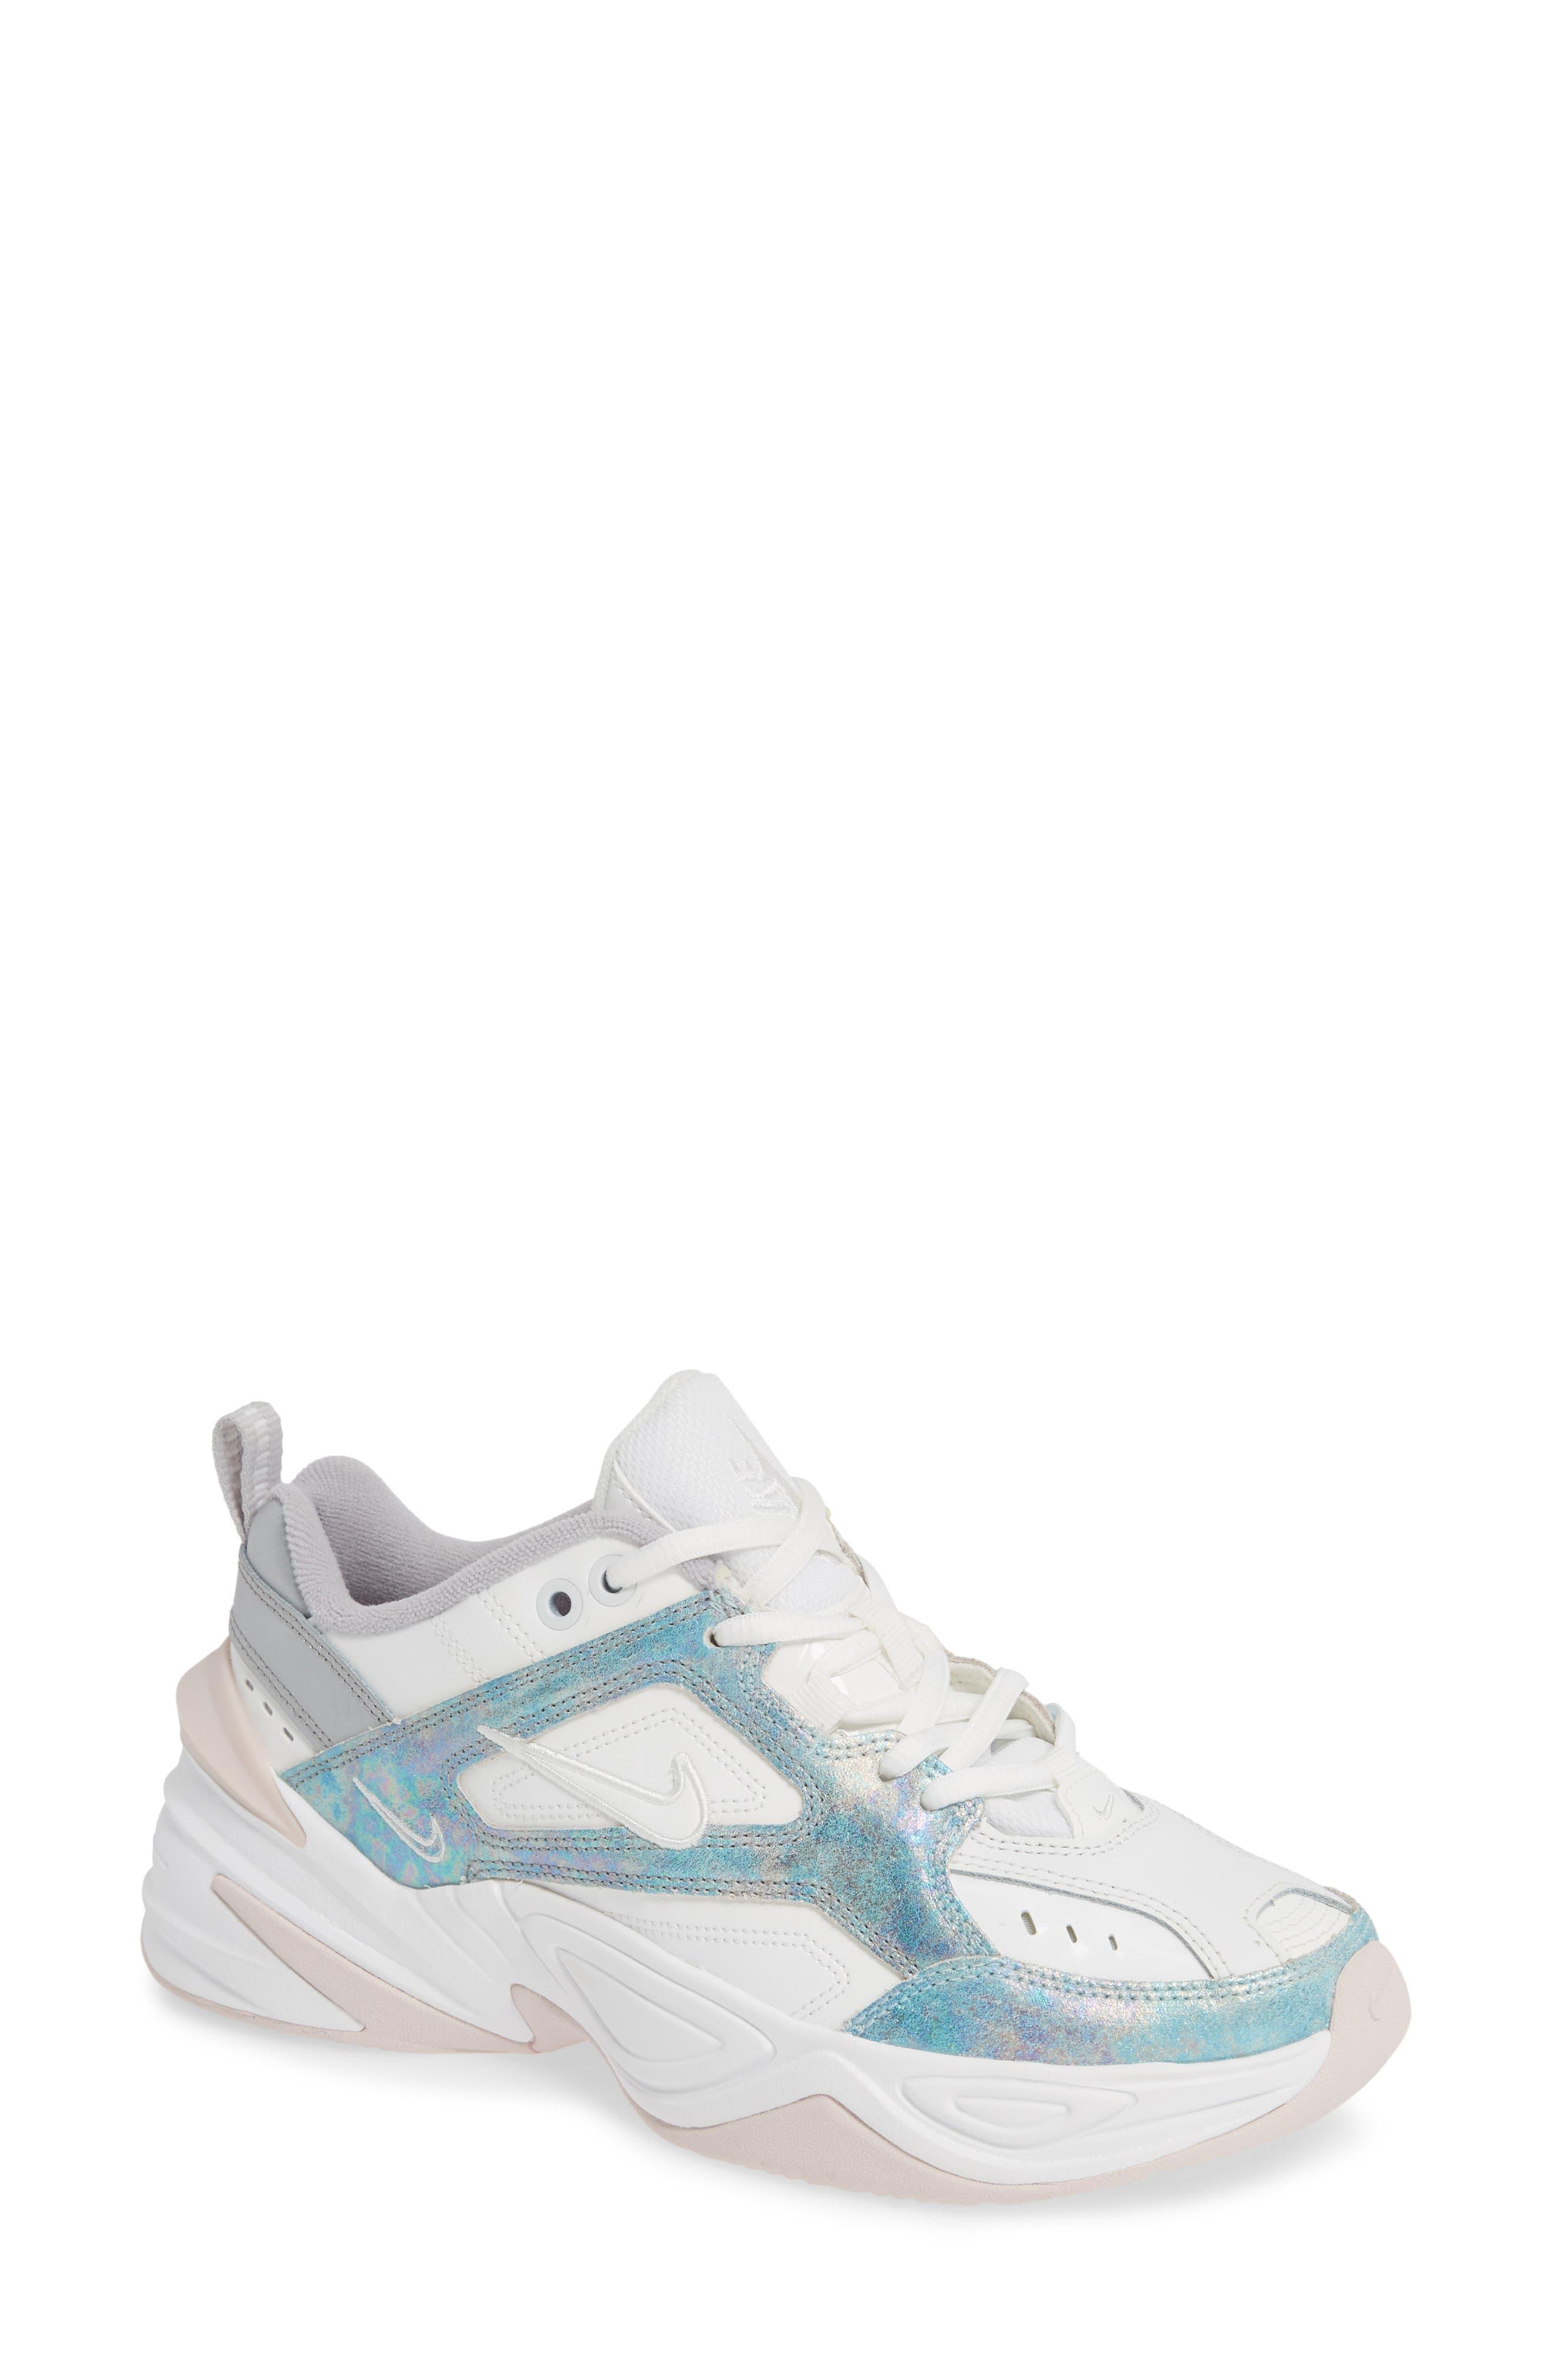 NIKE M2K Tekno Sneaker, Main, color, SUMMIT WHITE/ BARELY ROSE